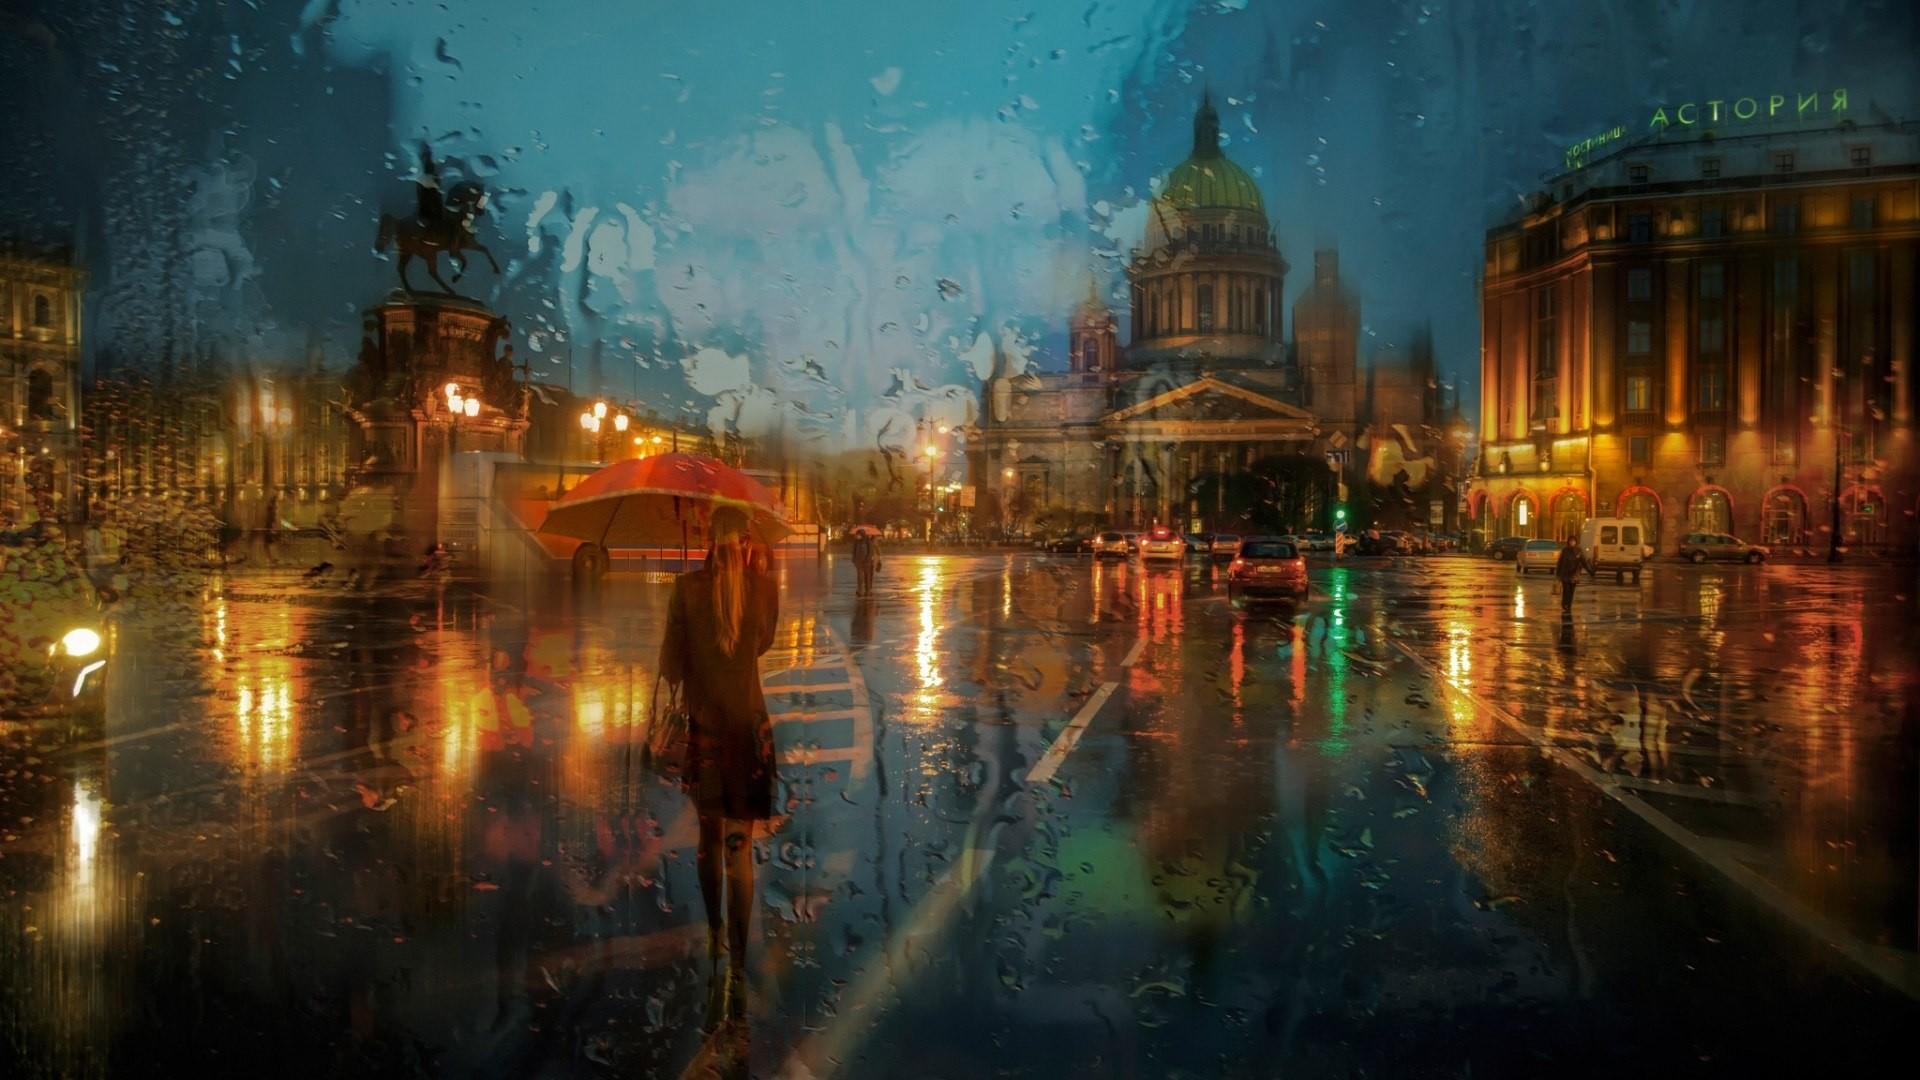 cool Rainy day wallpaper